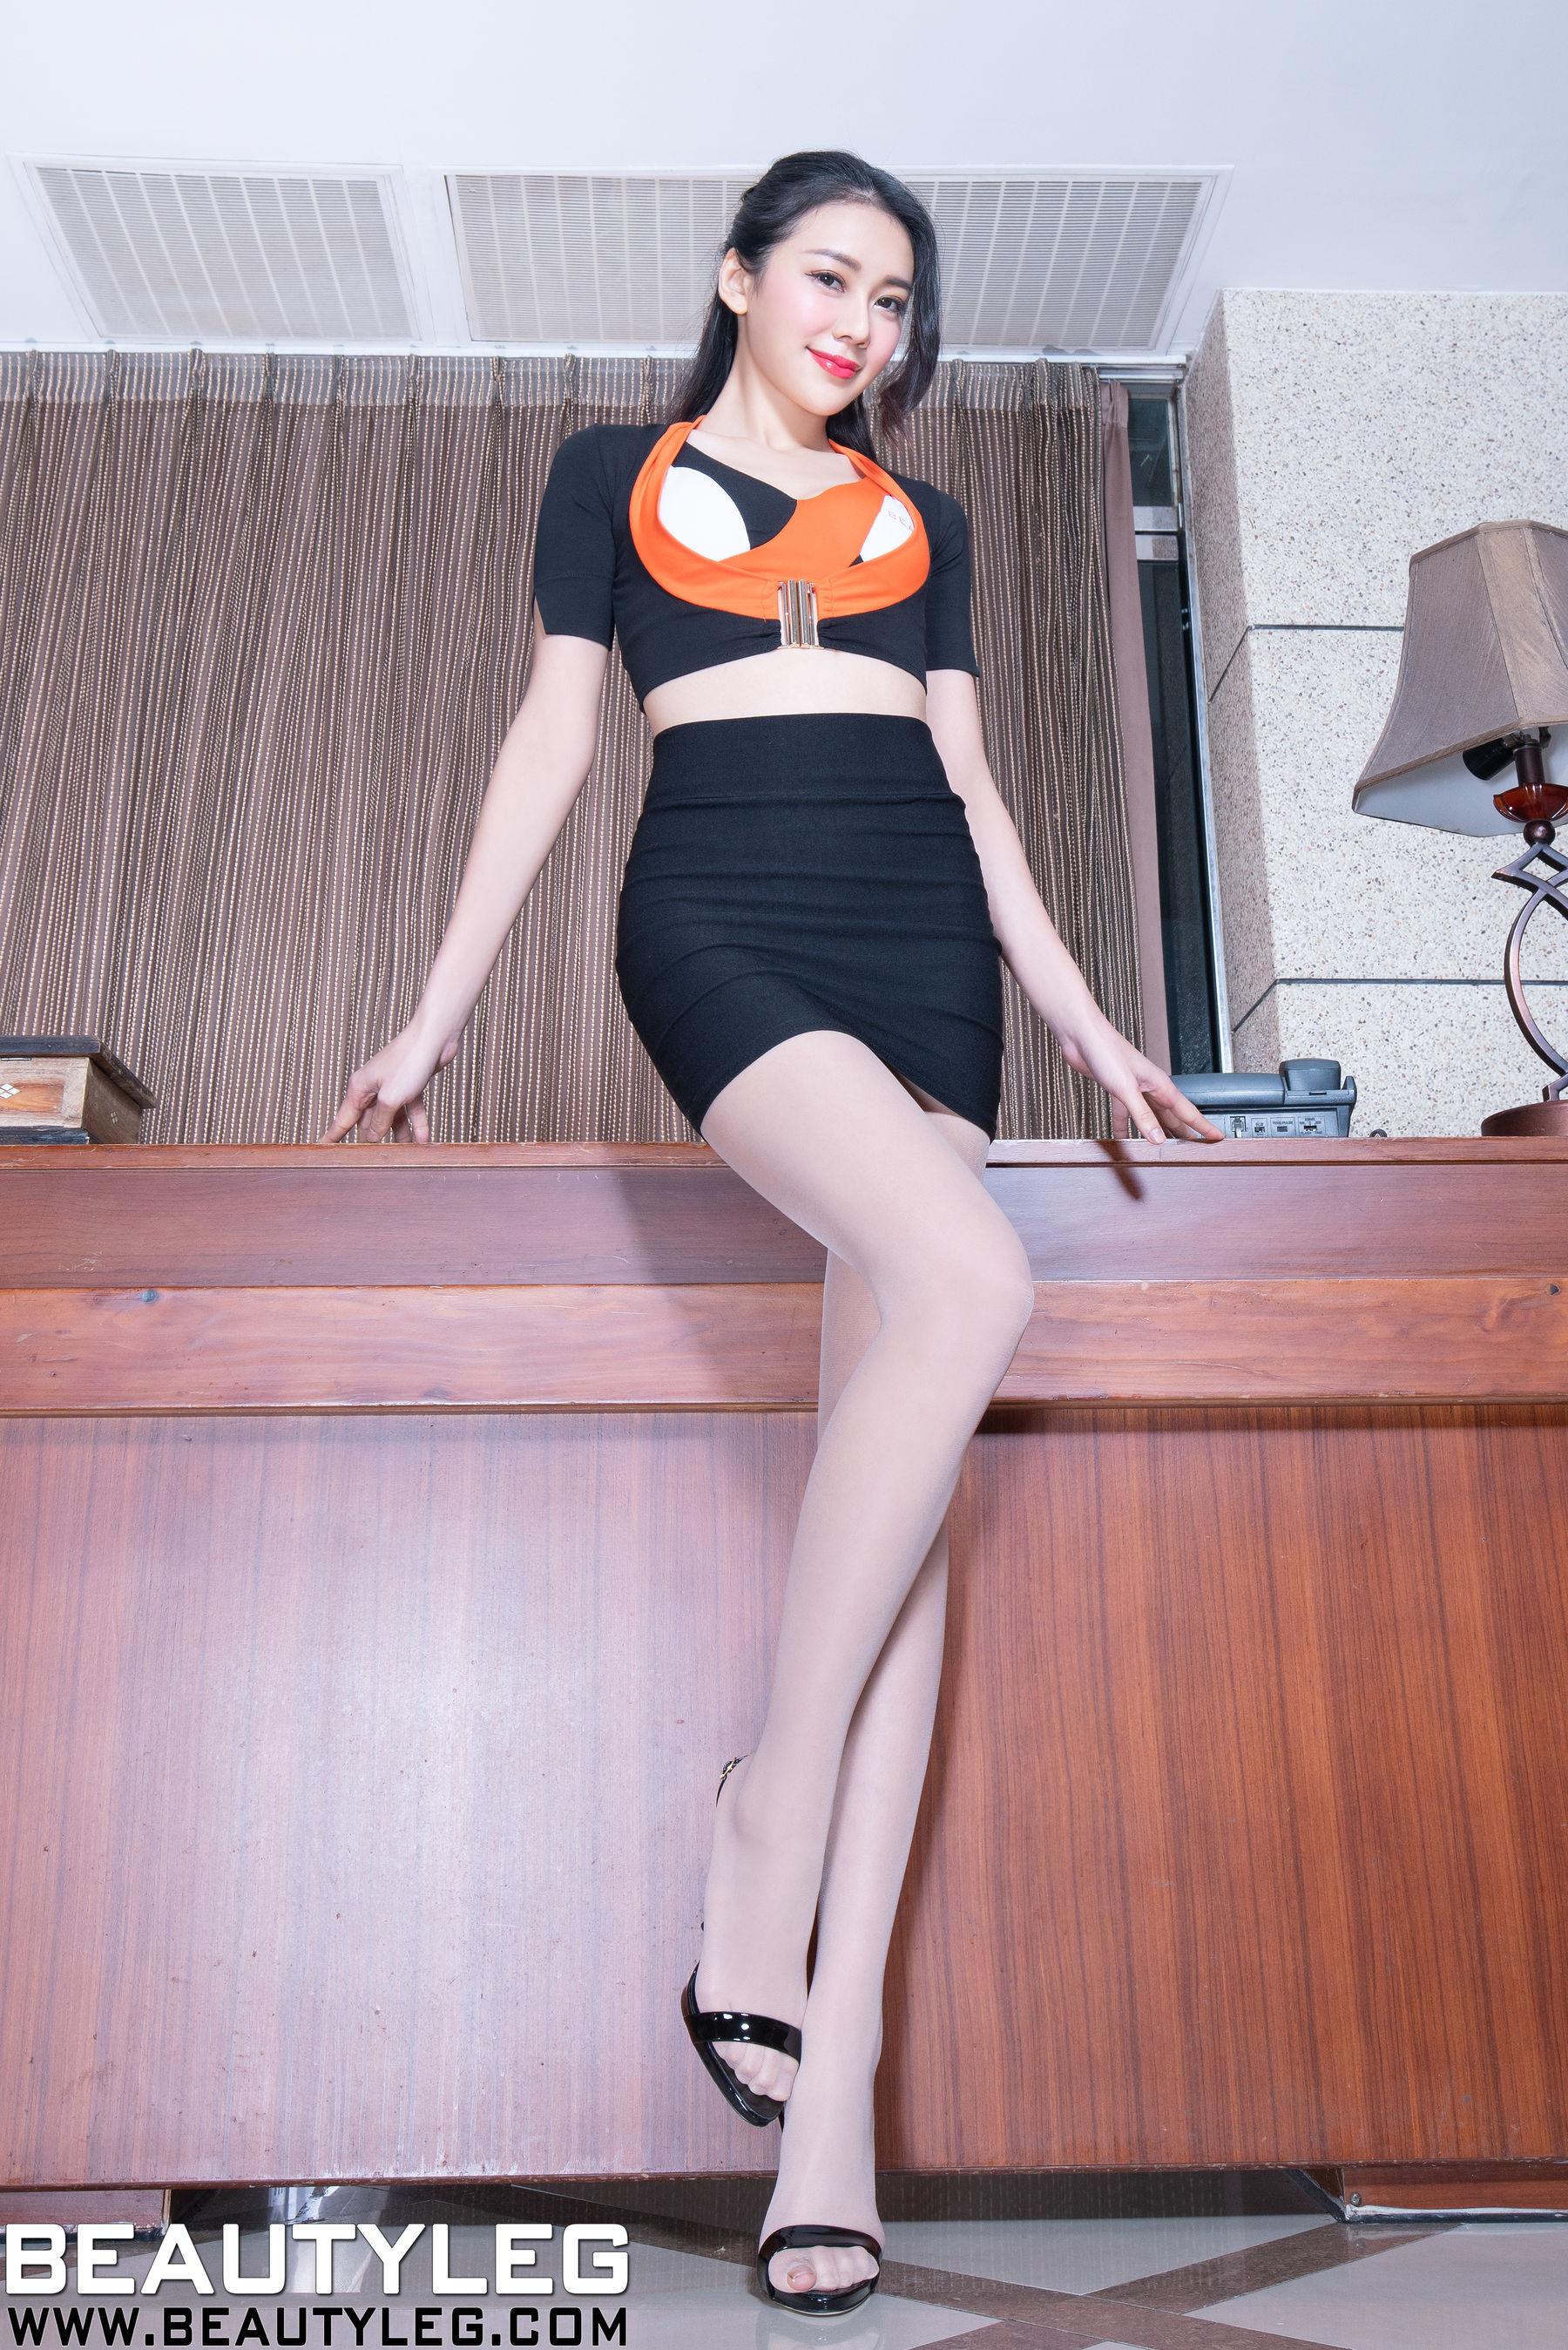 VOL.496 [Beautyleg]美腿长腿美女丝袜制服:钱洪琳(腿模Jennifer)超高清个人性感漂亮大图(53P)